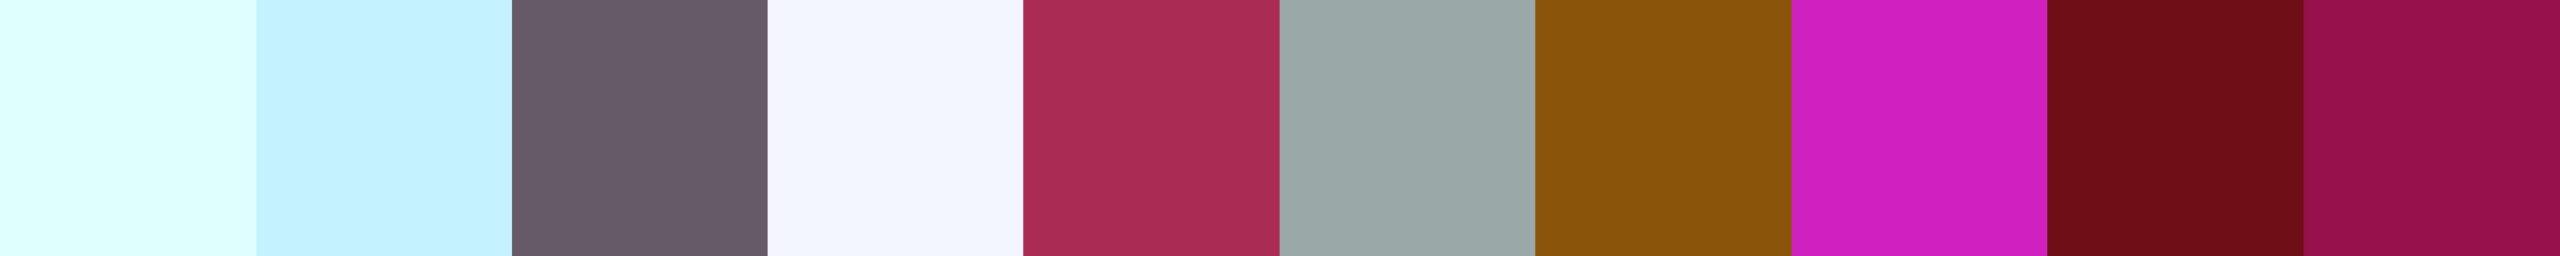 58 Kirepolia Color Palette